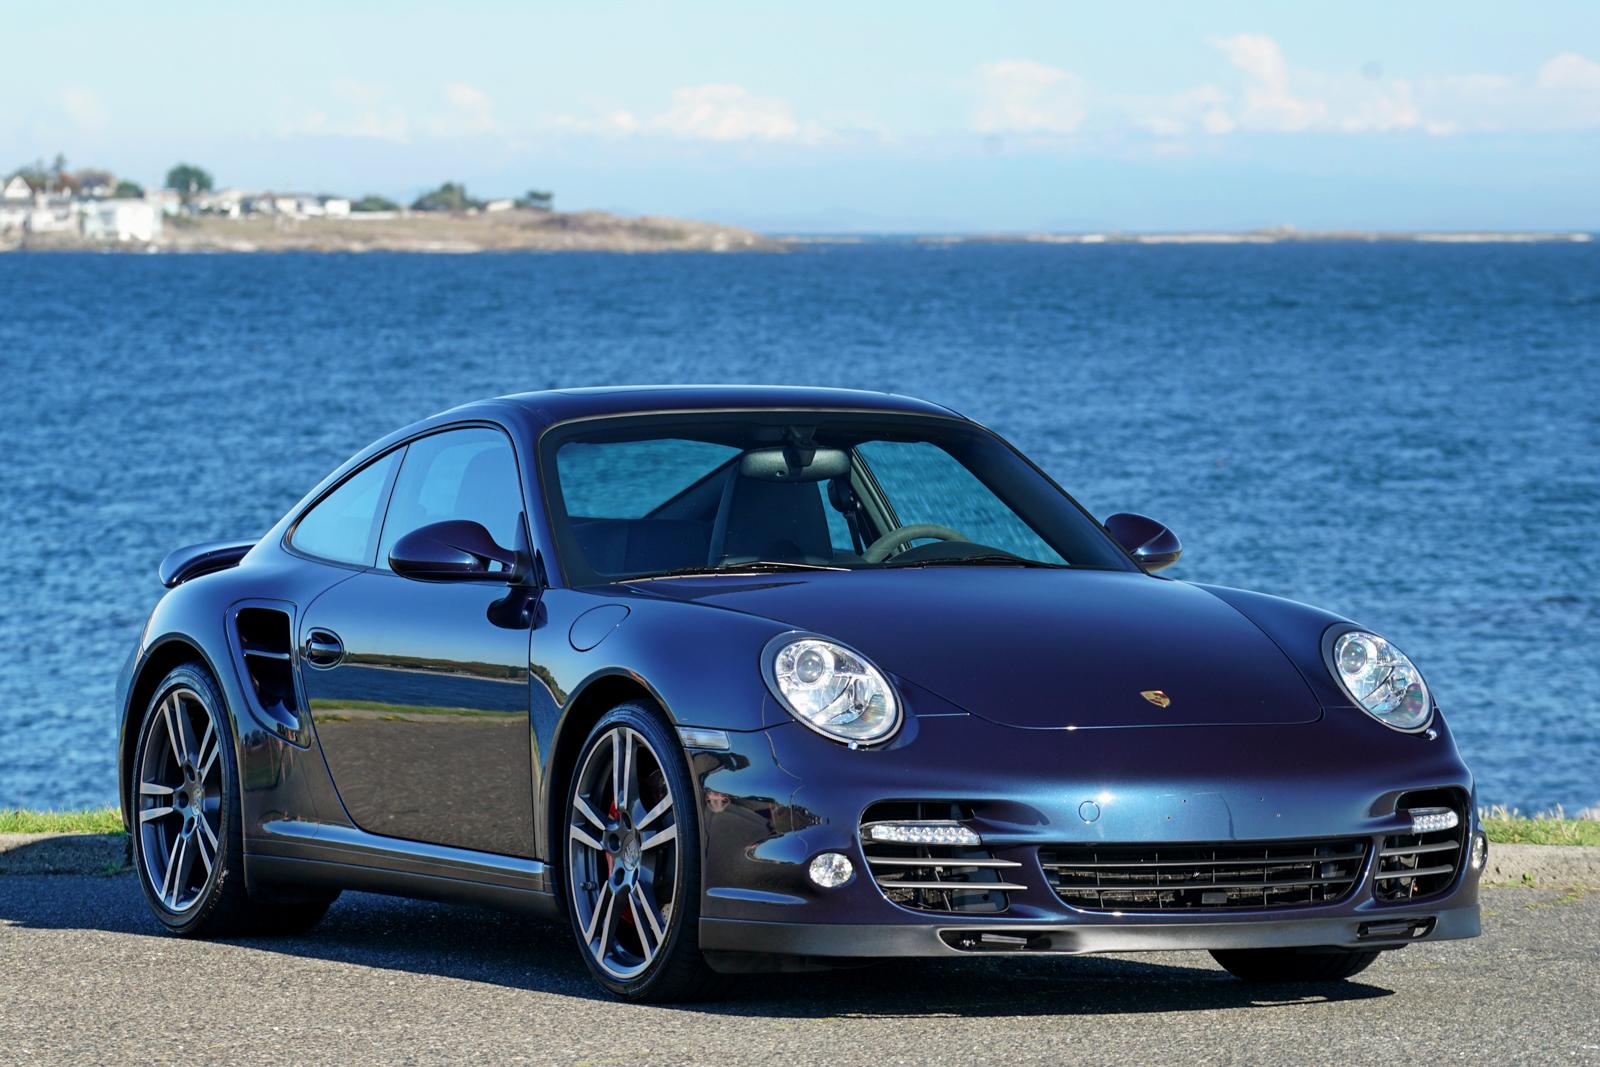 2010 porsche 911 turbo 997 silver arrow cars ltd. Black Bedroom Furniture Sets. Home Design Ideas